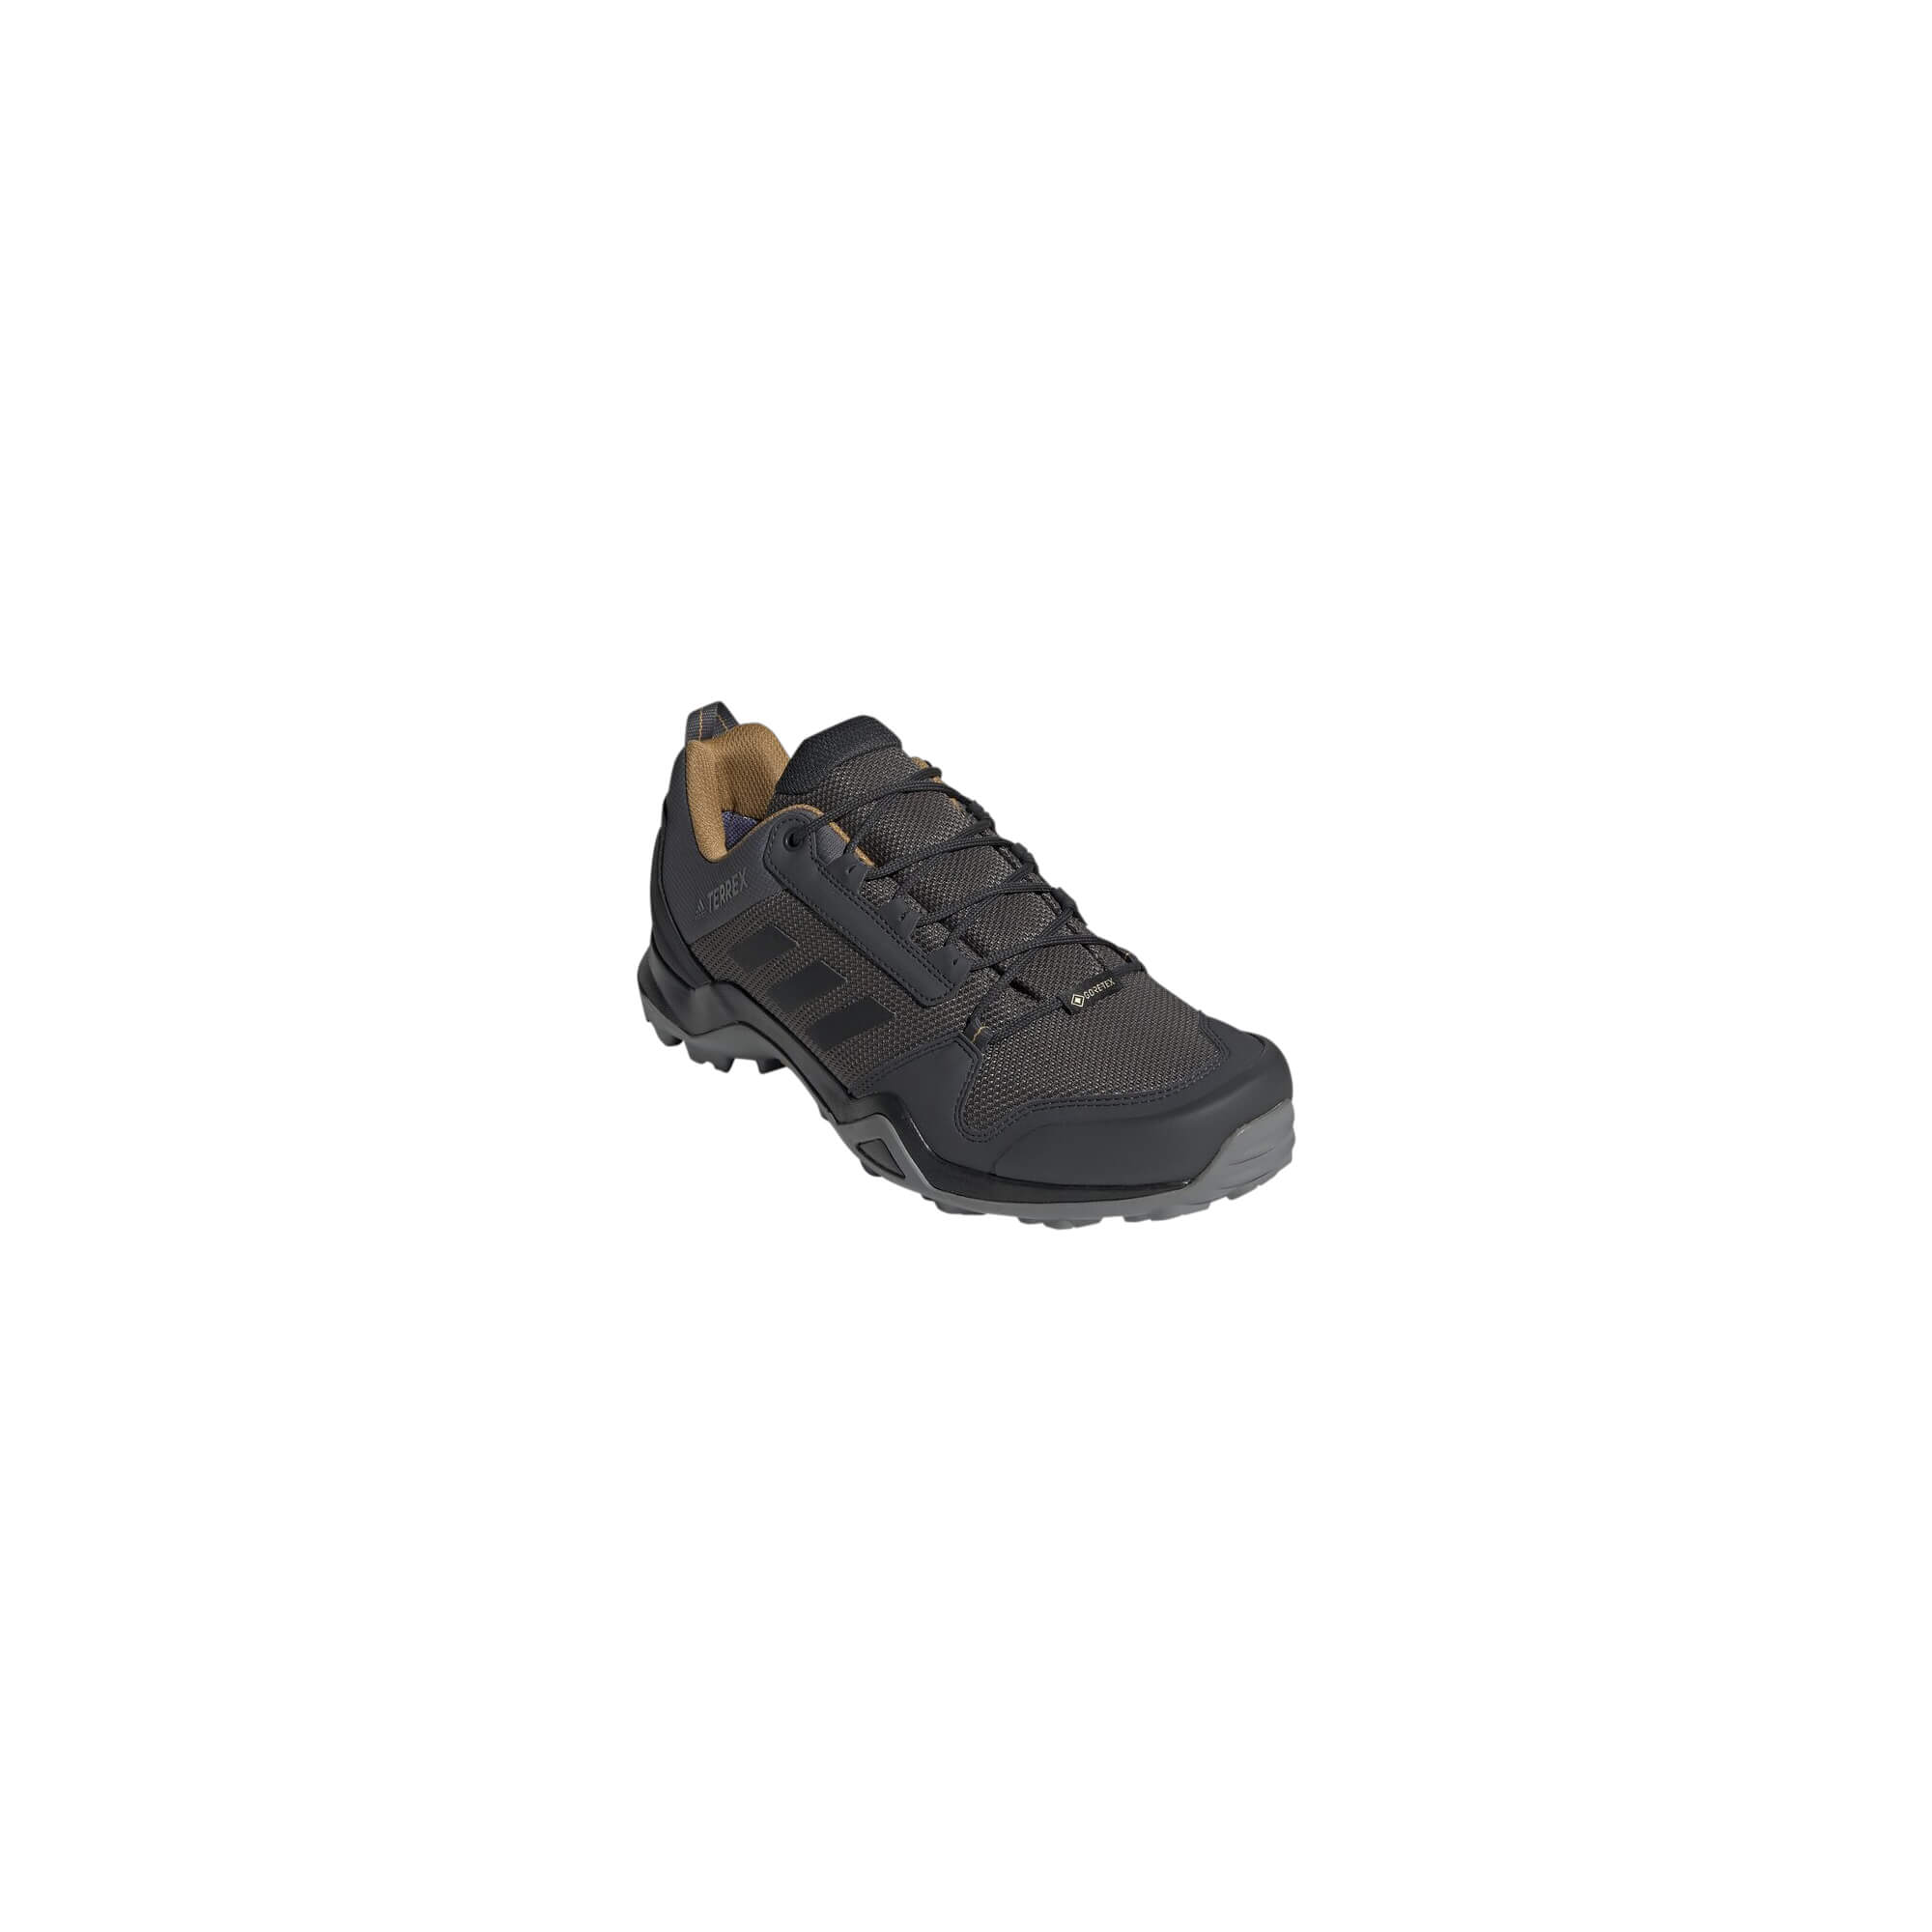 adidas Muska hiking obuca Siv 45 13 TERREX AX3 GTX